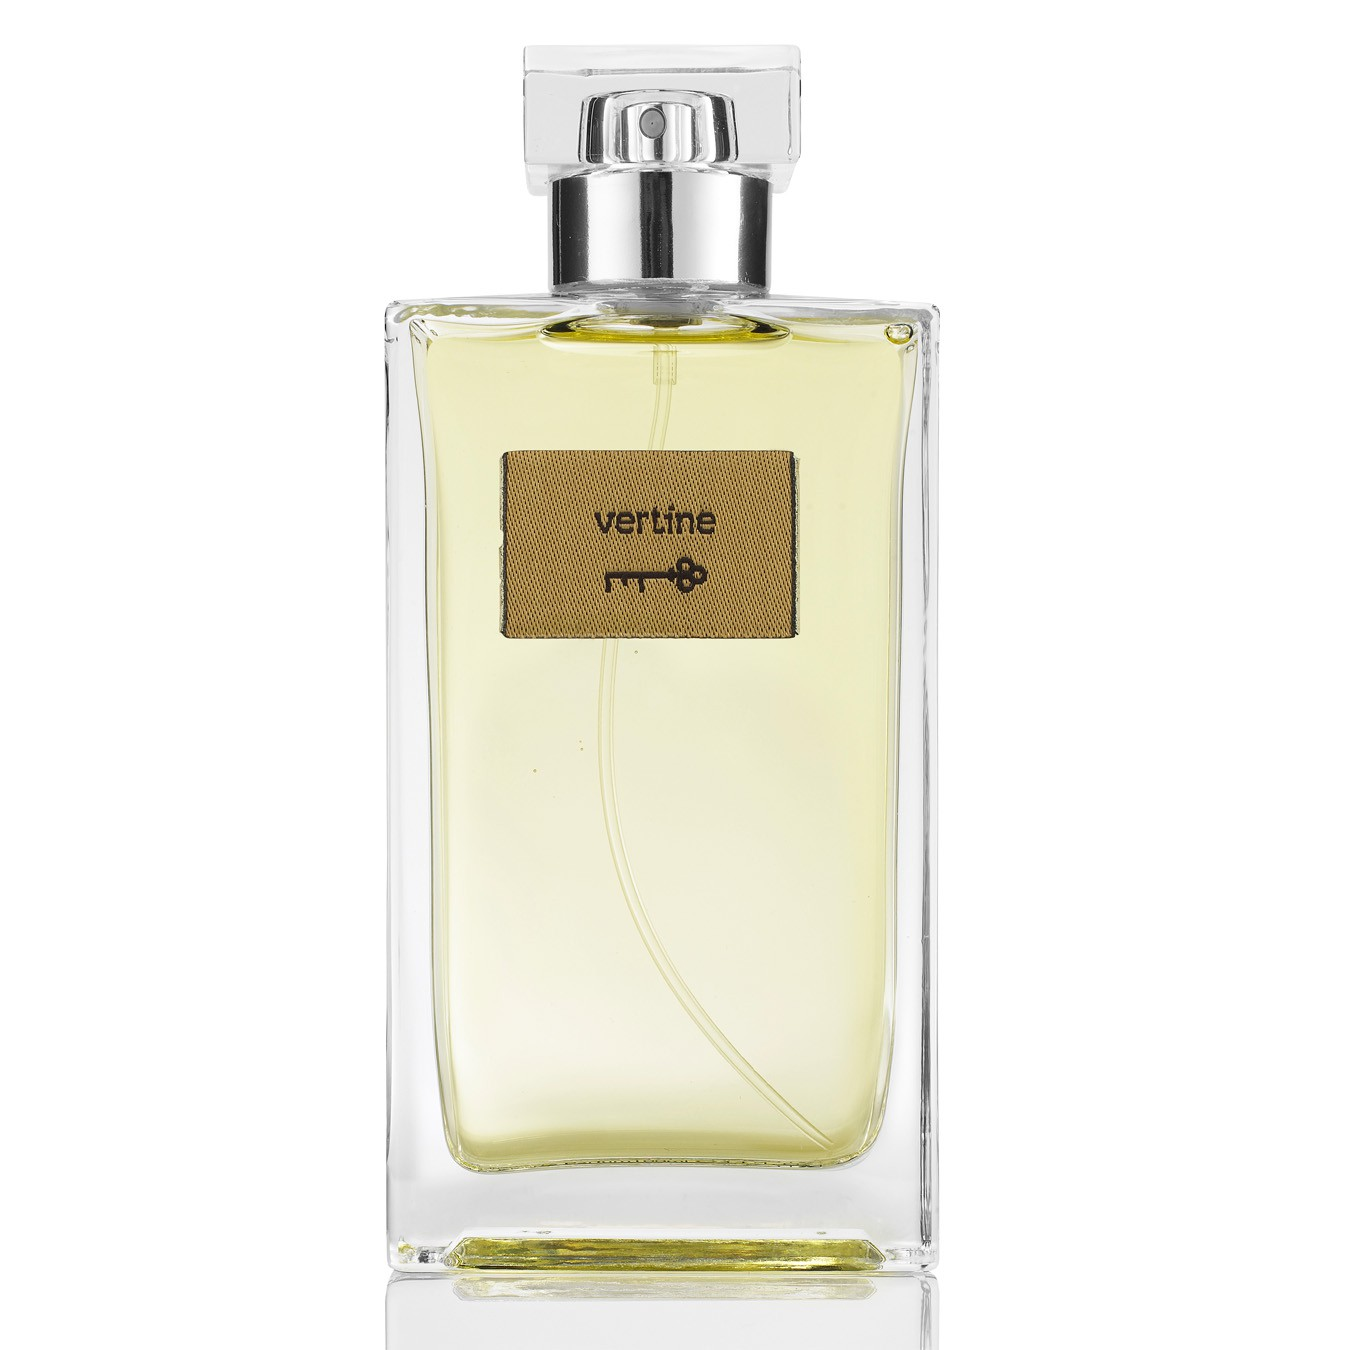 Friedemodin Vertine аромат для женщин